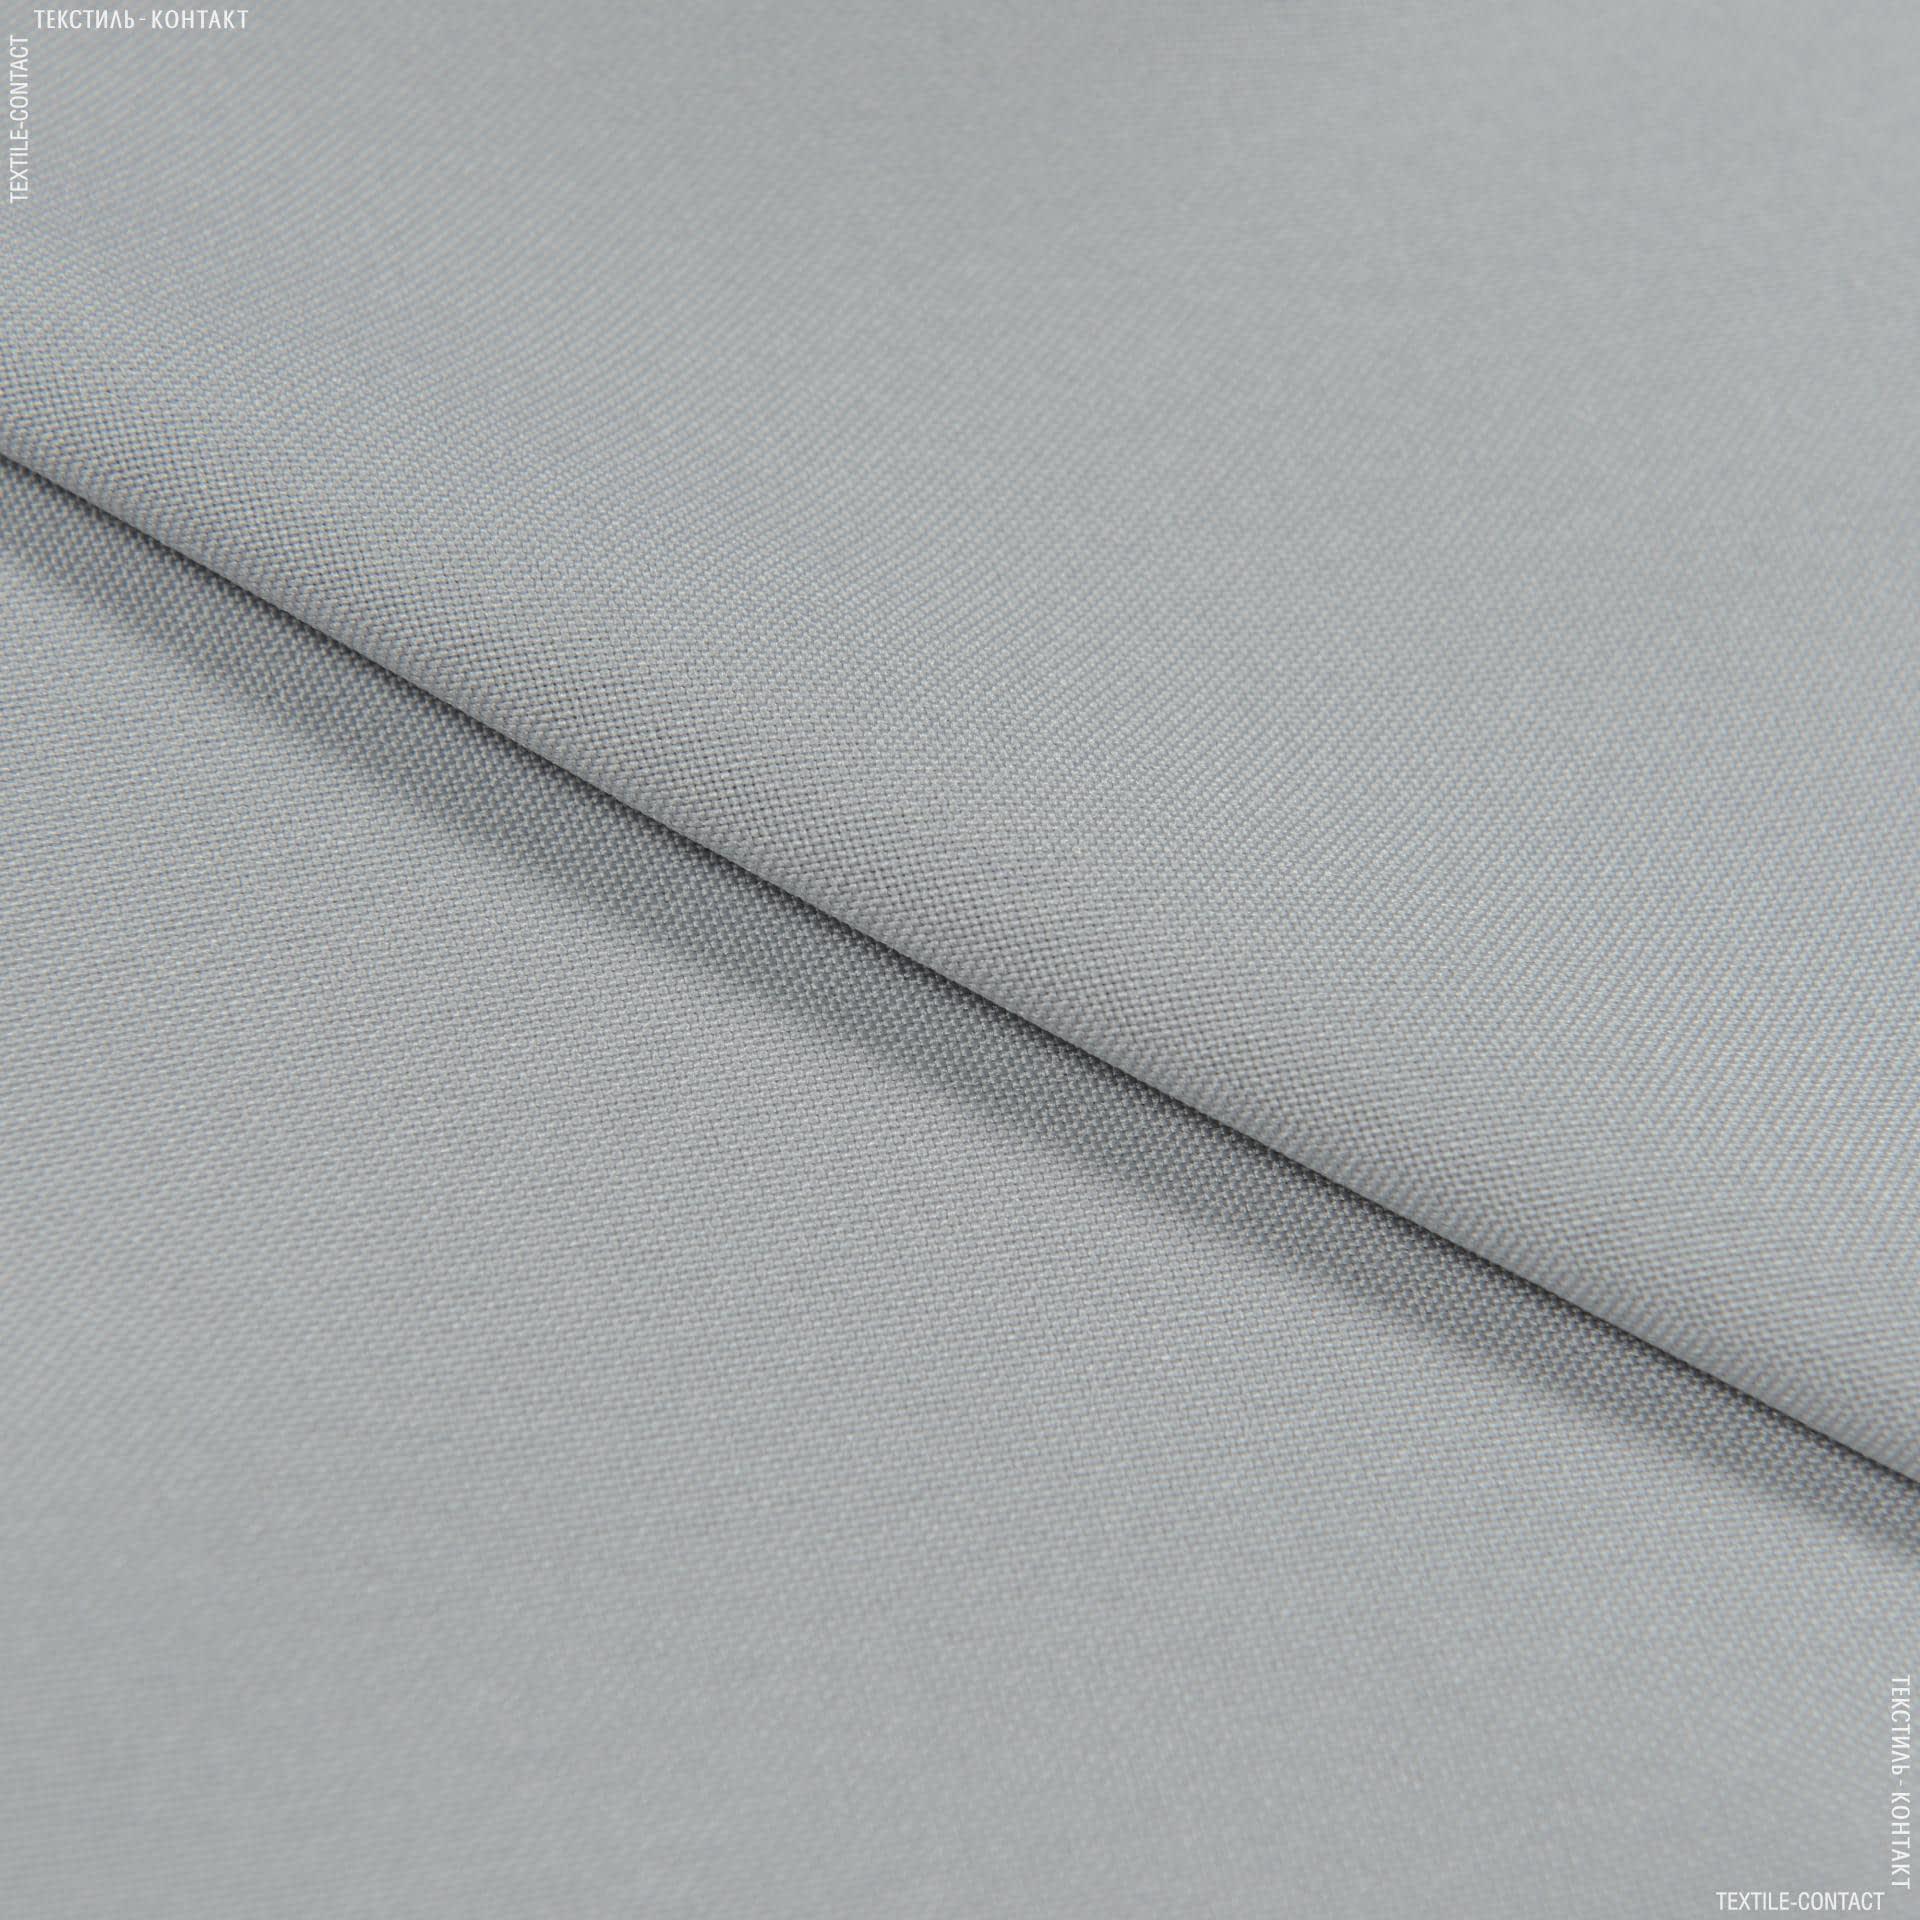 Ткани для брюк - Габардин серый